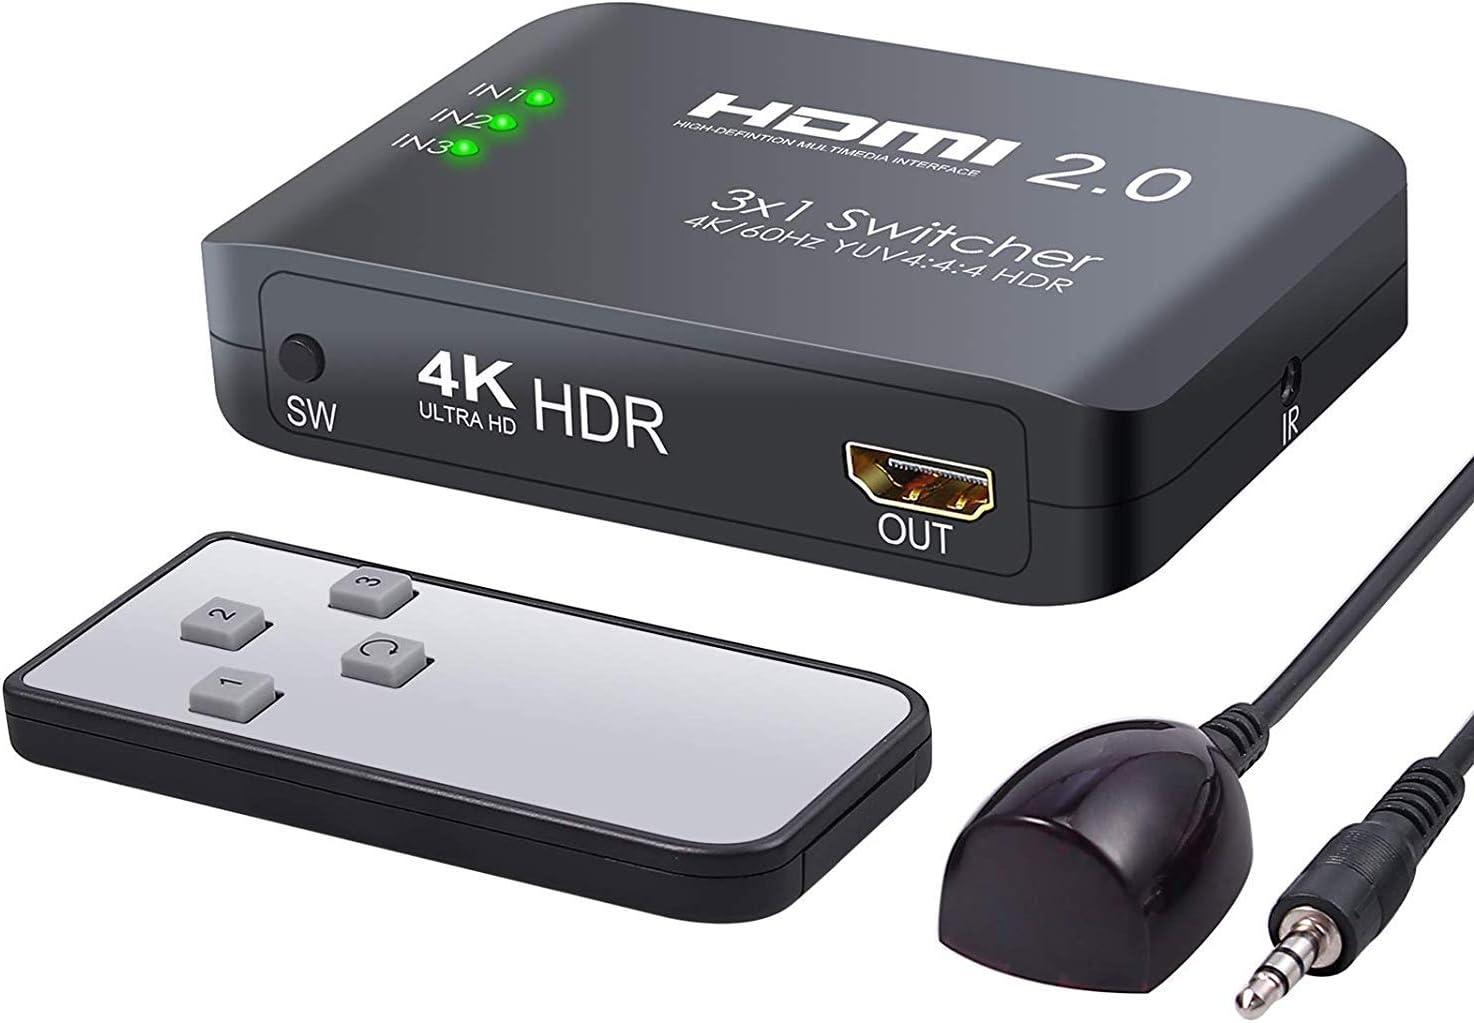 ICT HDMI 2.0 4K Ultra HD HDR3 en 1 Puerto HDMI Switch Hub Splitter Ultra HD para PC HDTV: Amazon.es: Electrónica